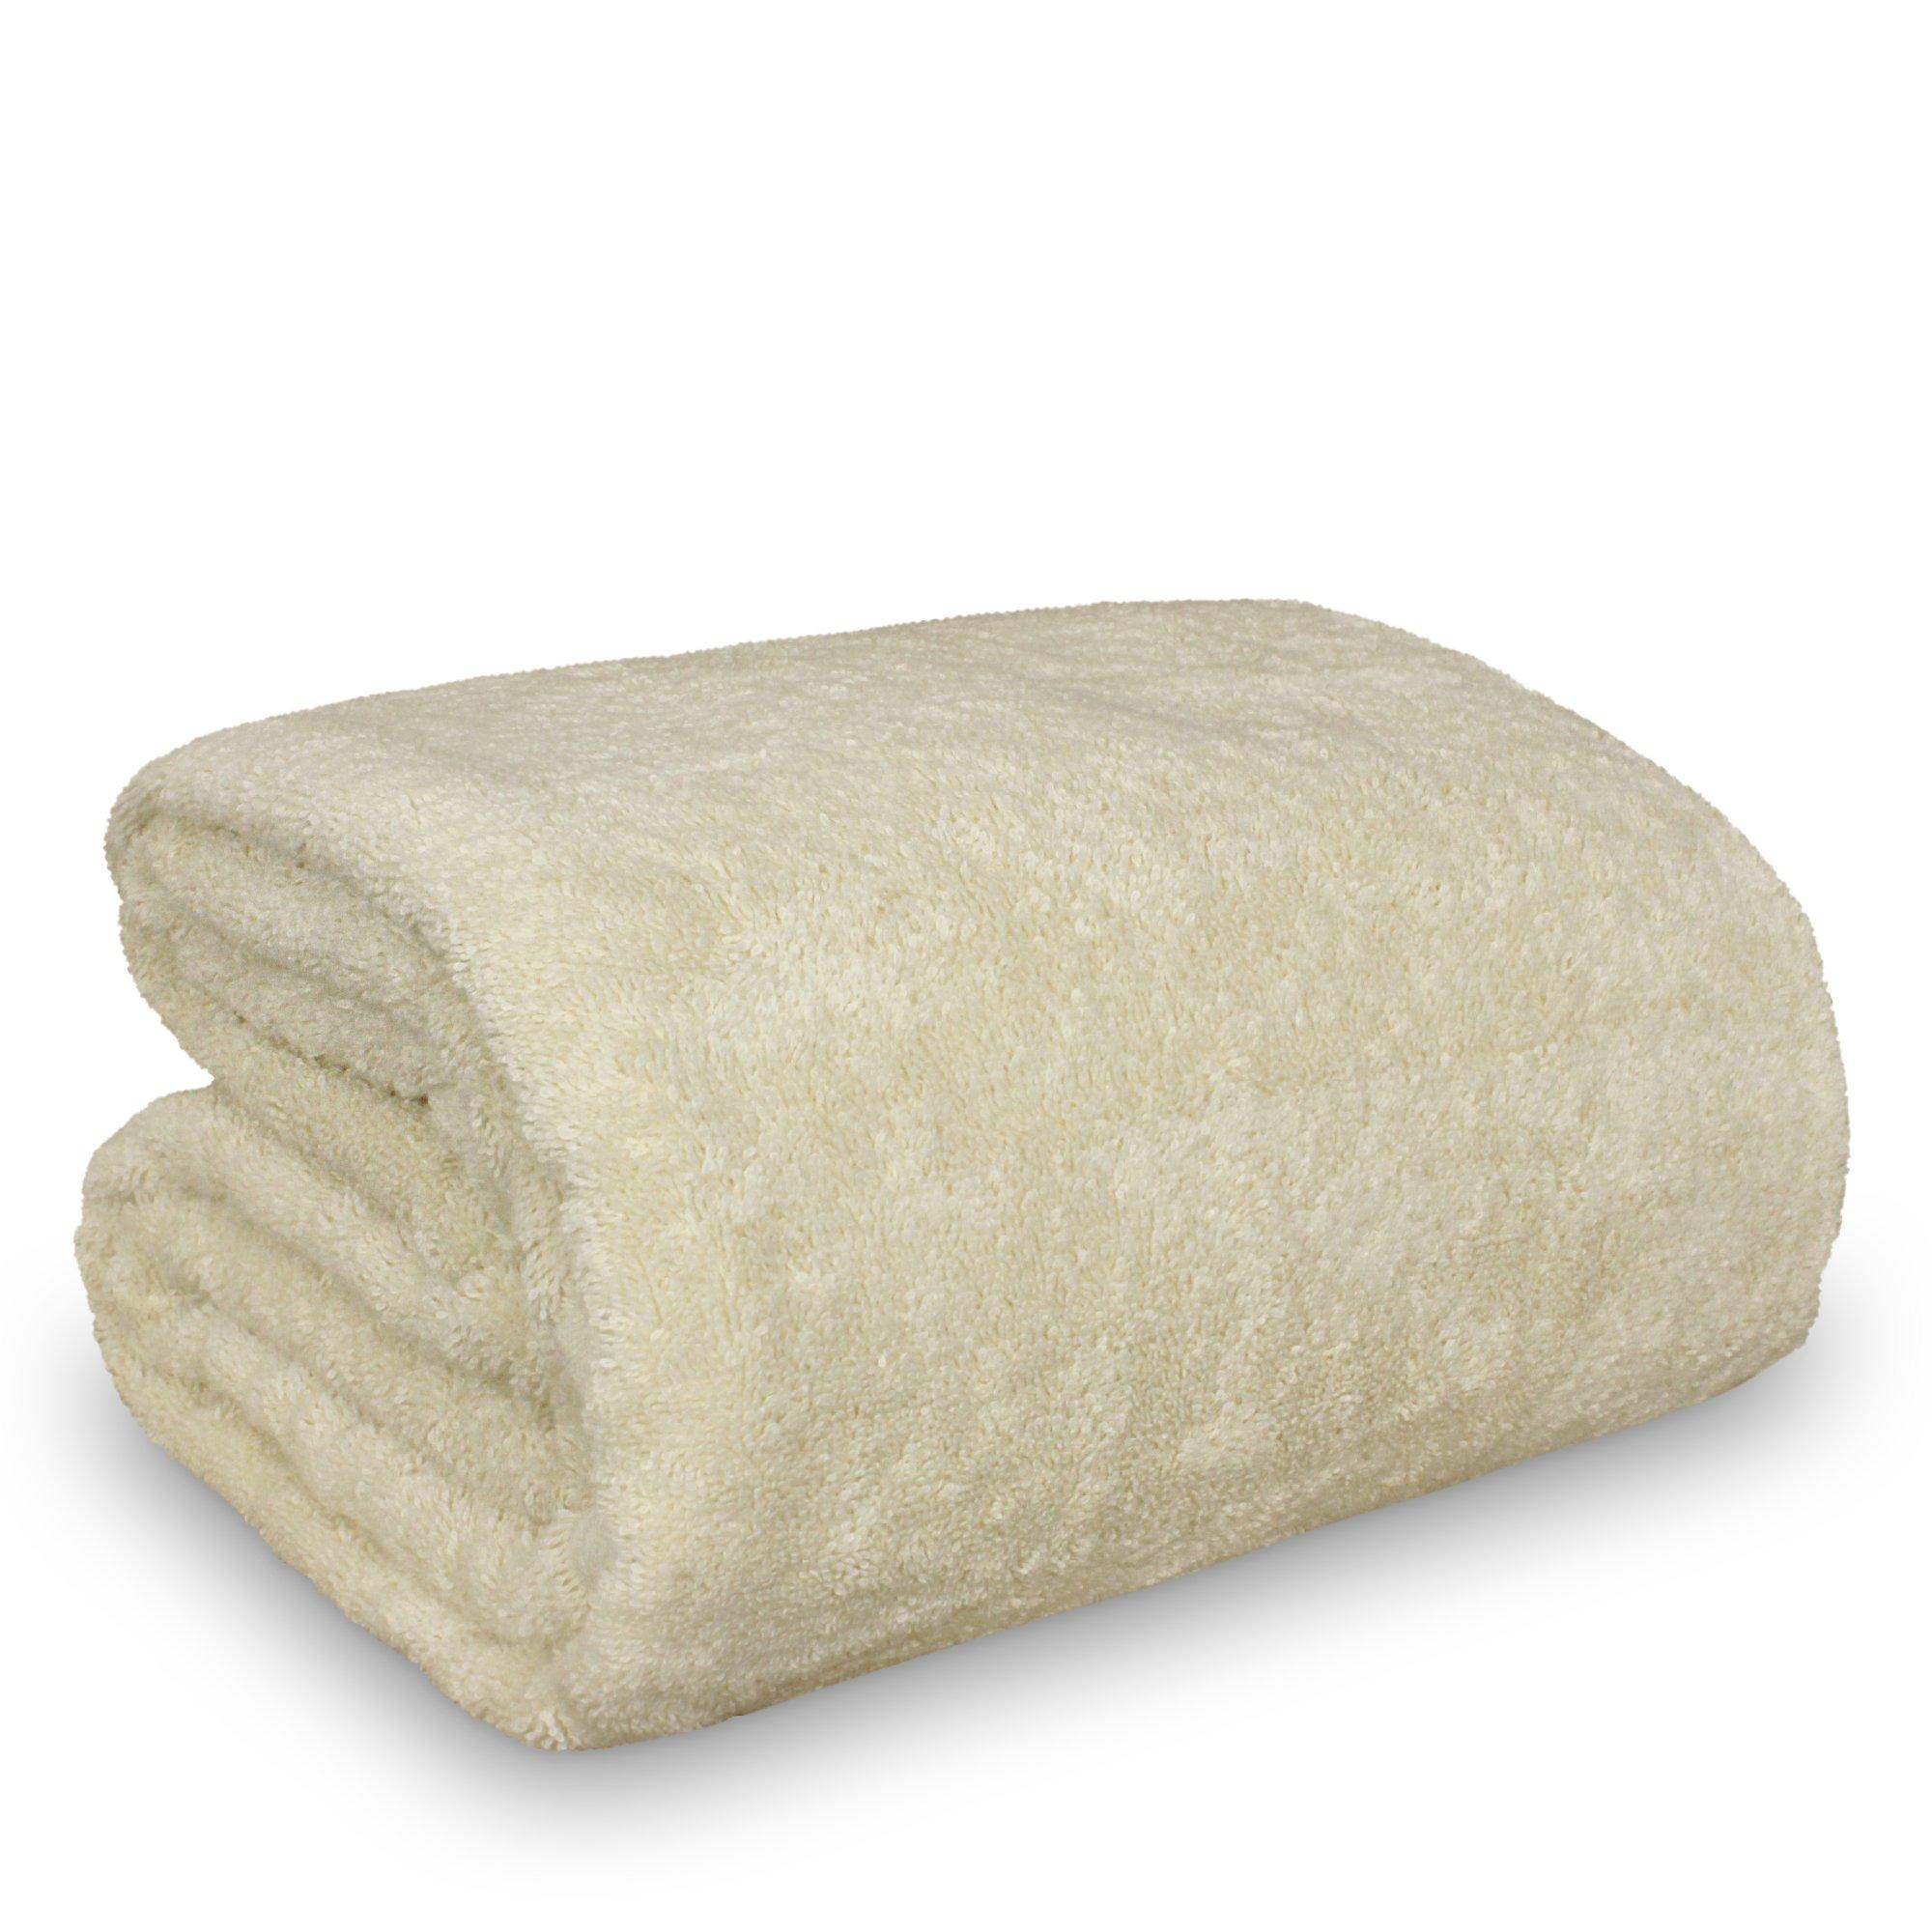 Luxury Hotel & Spa Towel Turkish Cotton … (Oversized Bath Sheet 40''x80'', Beige)